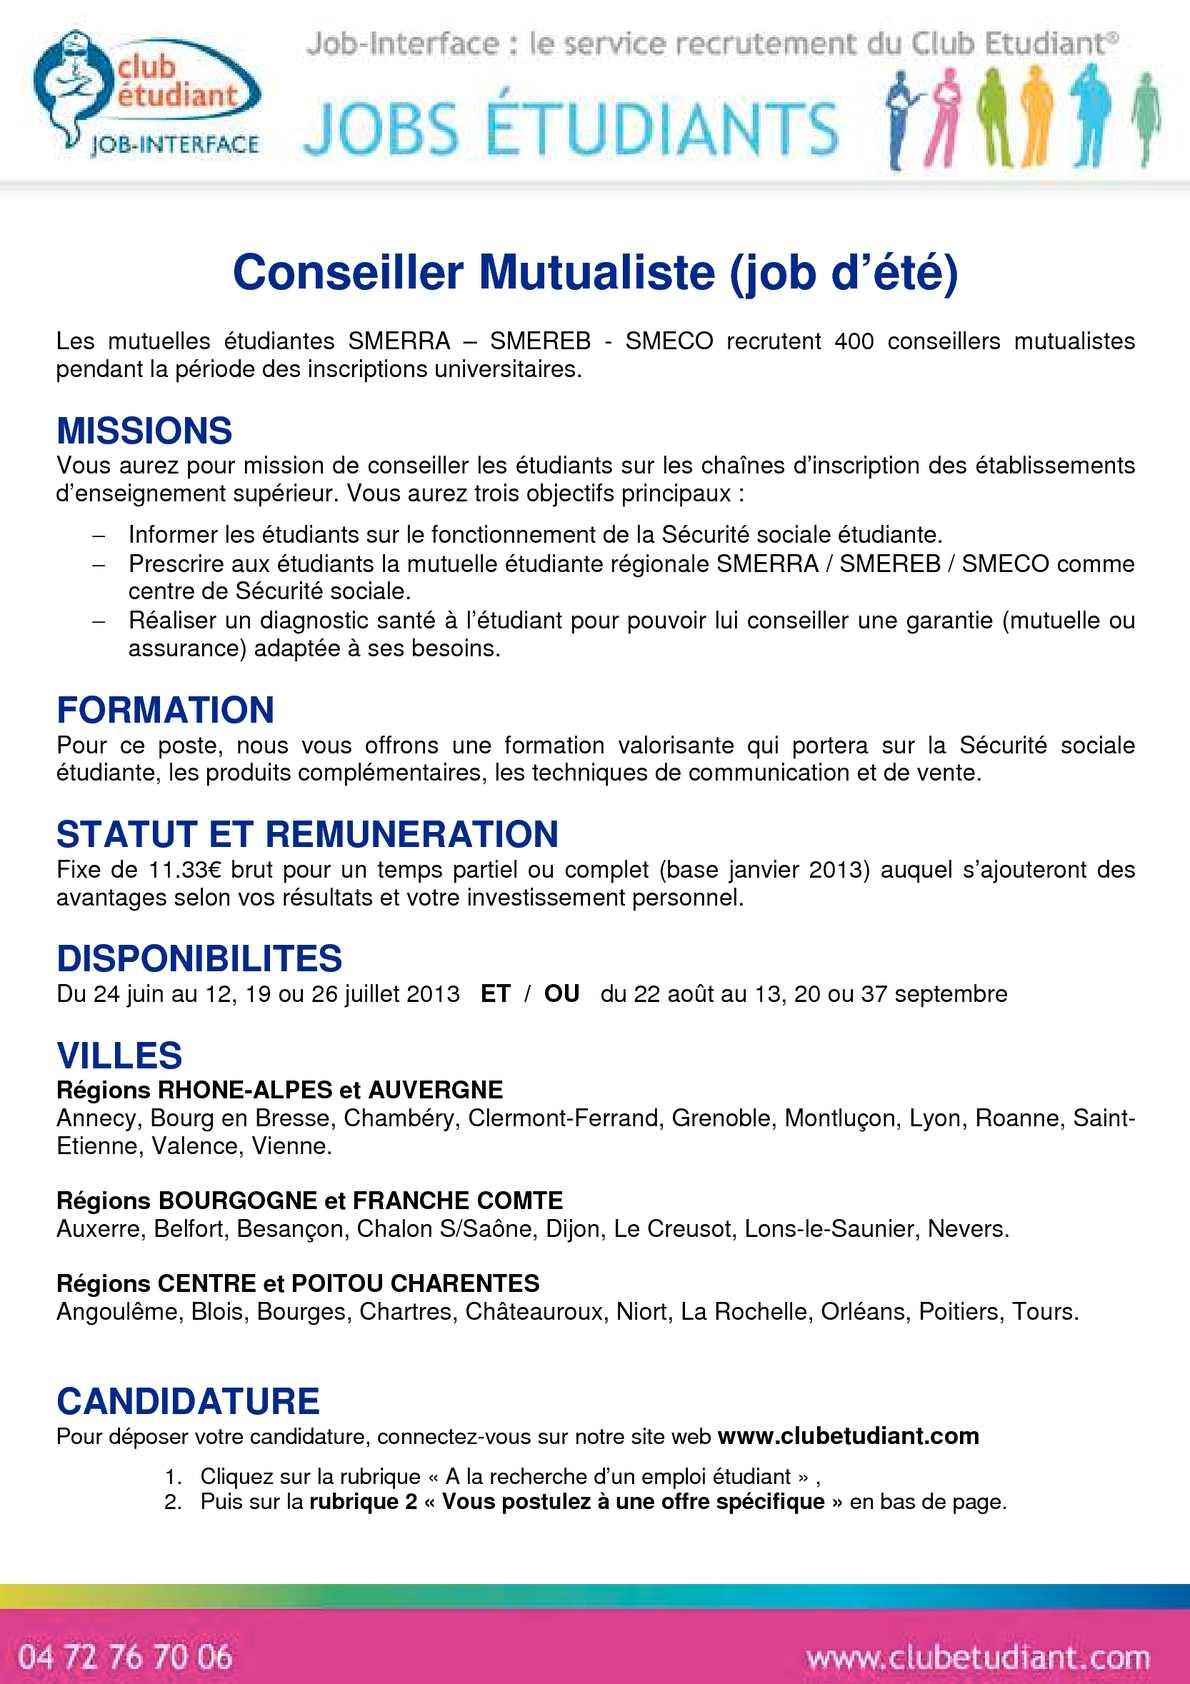 3fb8e7946f8 Calaméo - SMECO - Fiche de poste Conseiller Mutualiste 2013